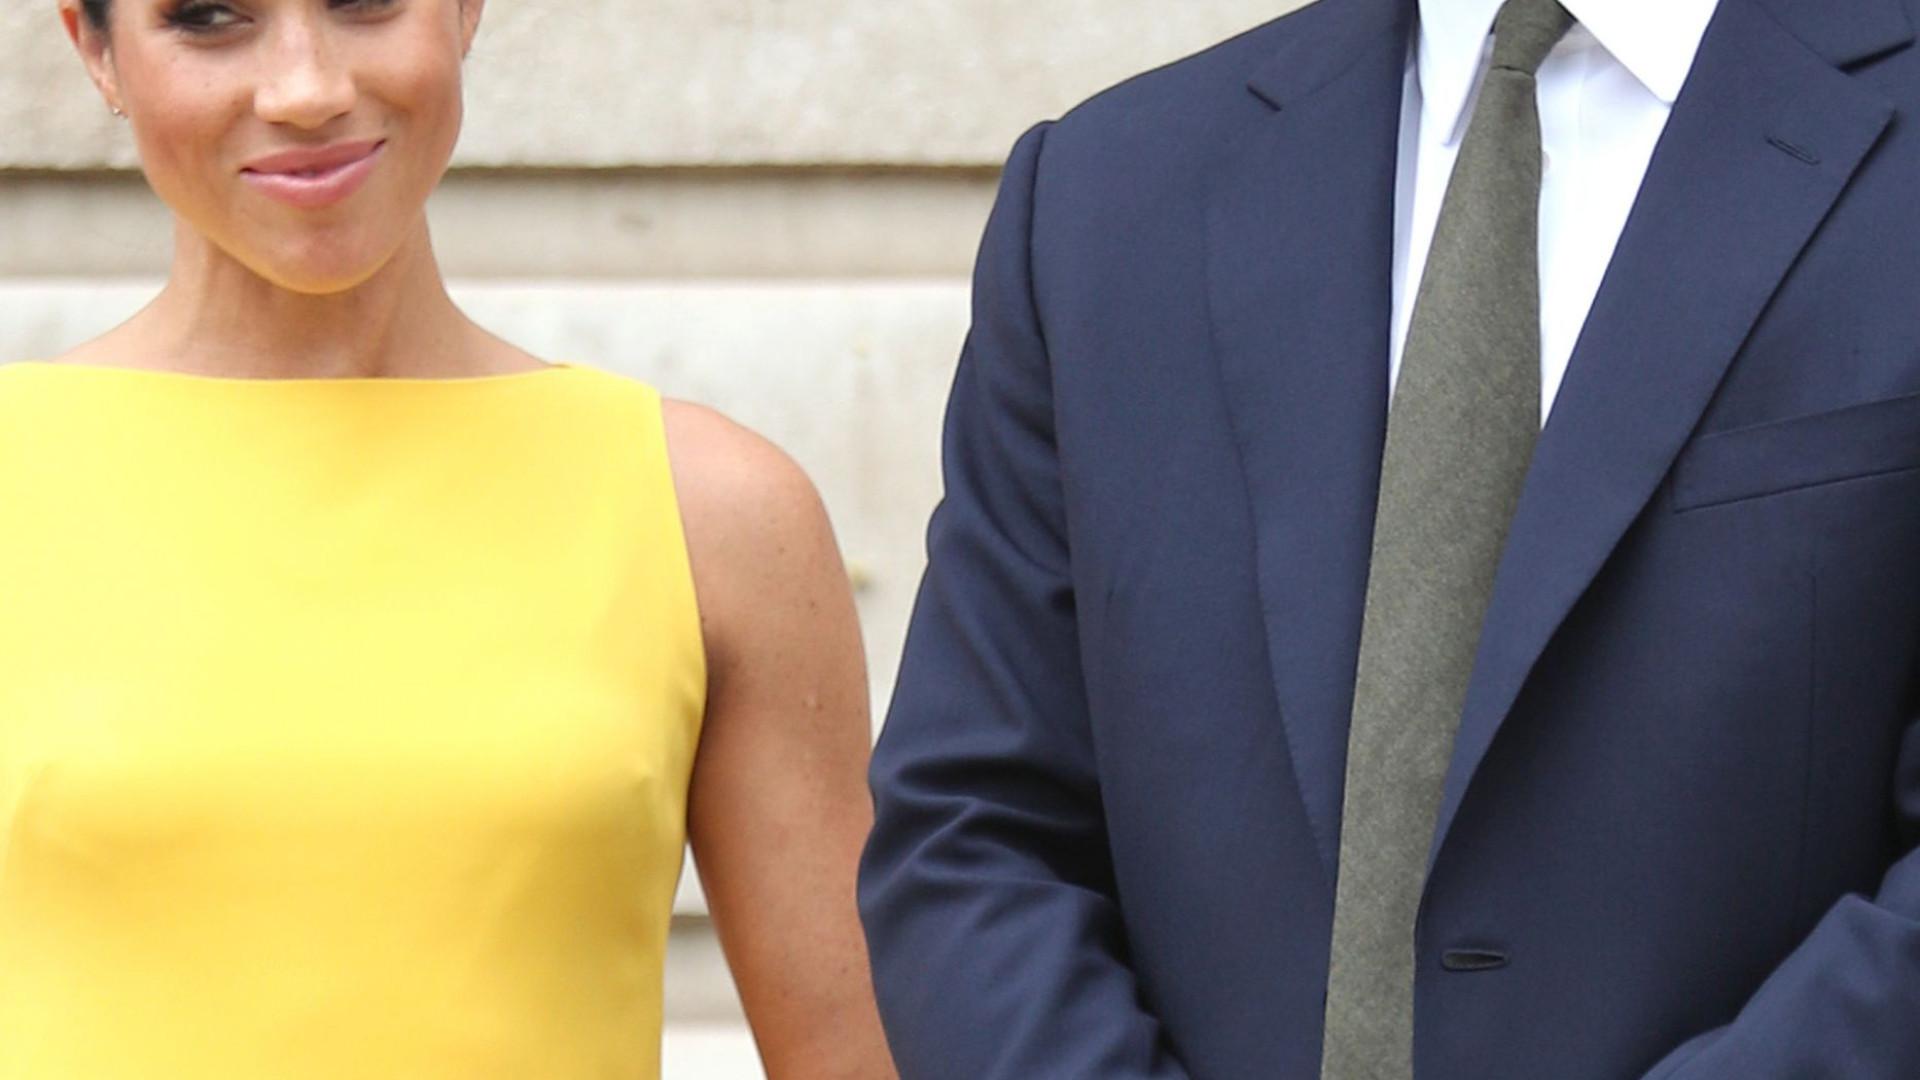 Príncipe Harry e Meghan Markle de saída do palácio. Casal vai mudar-se